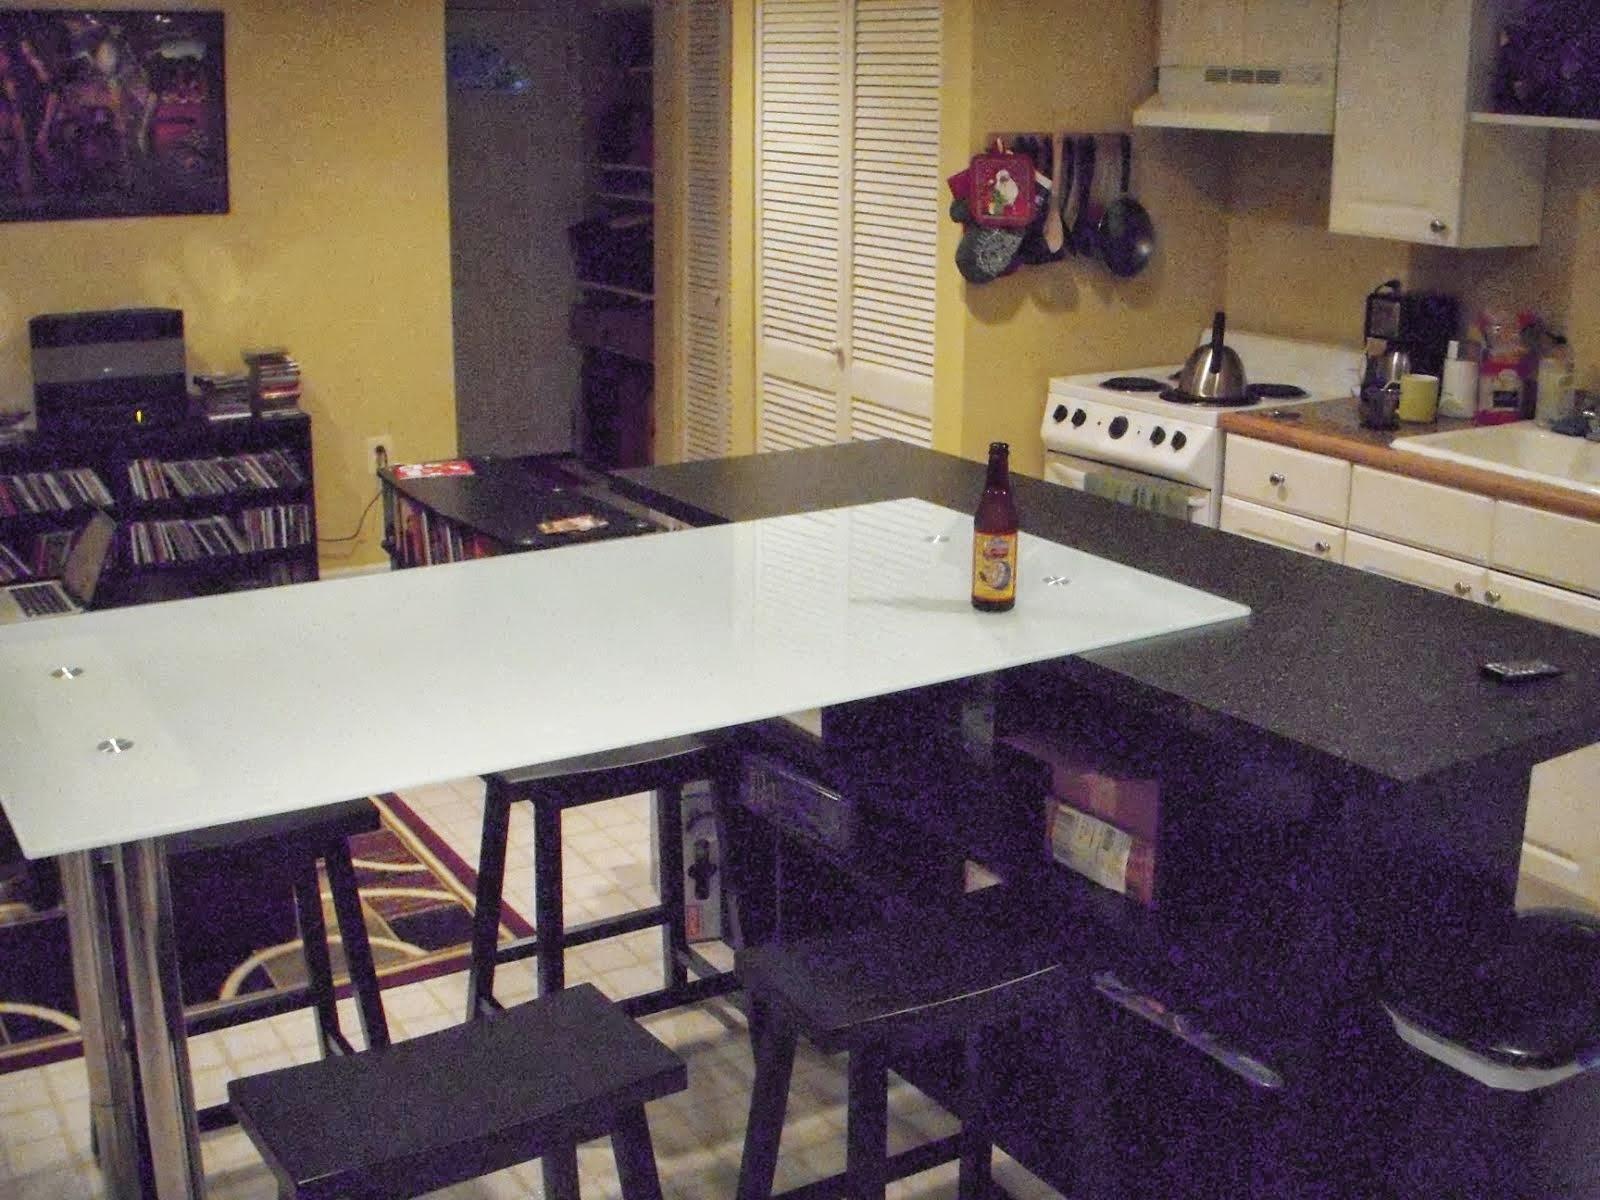 T Kitchen Island/Dining Table - IKEA Hackers - IKEA Hackers